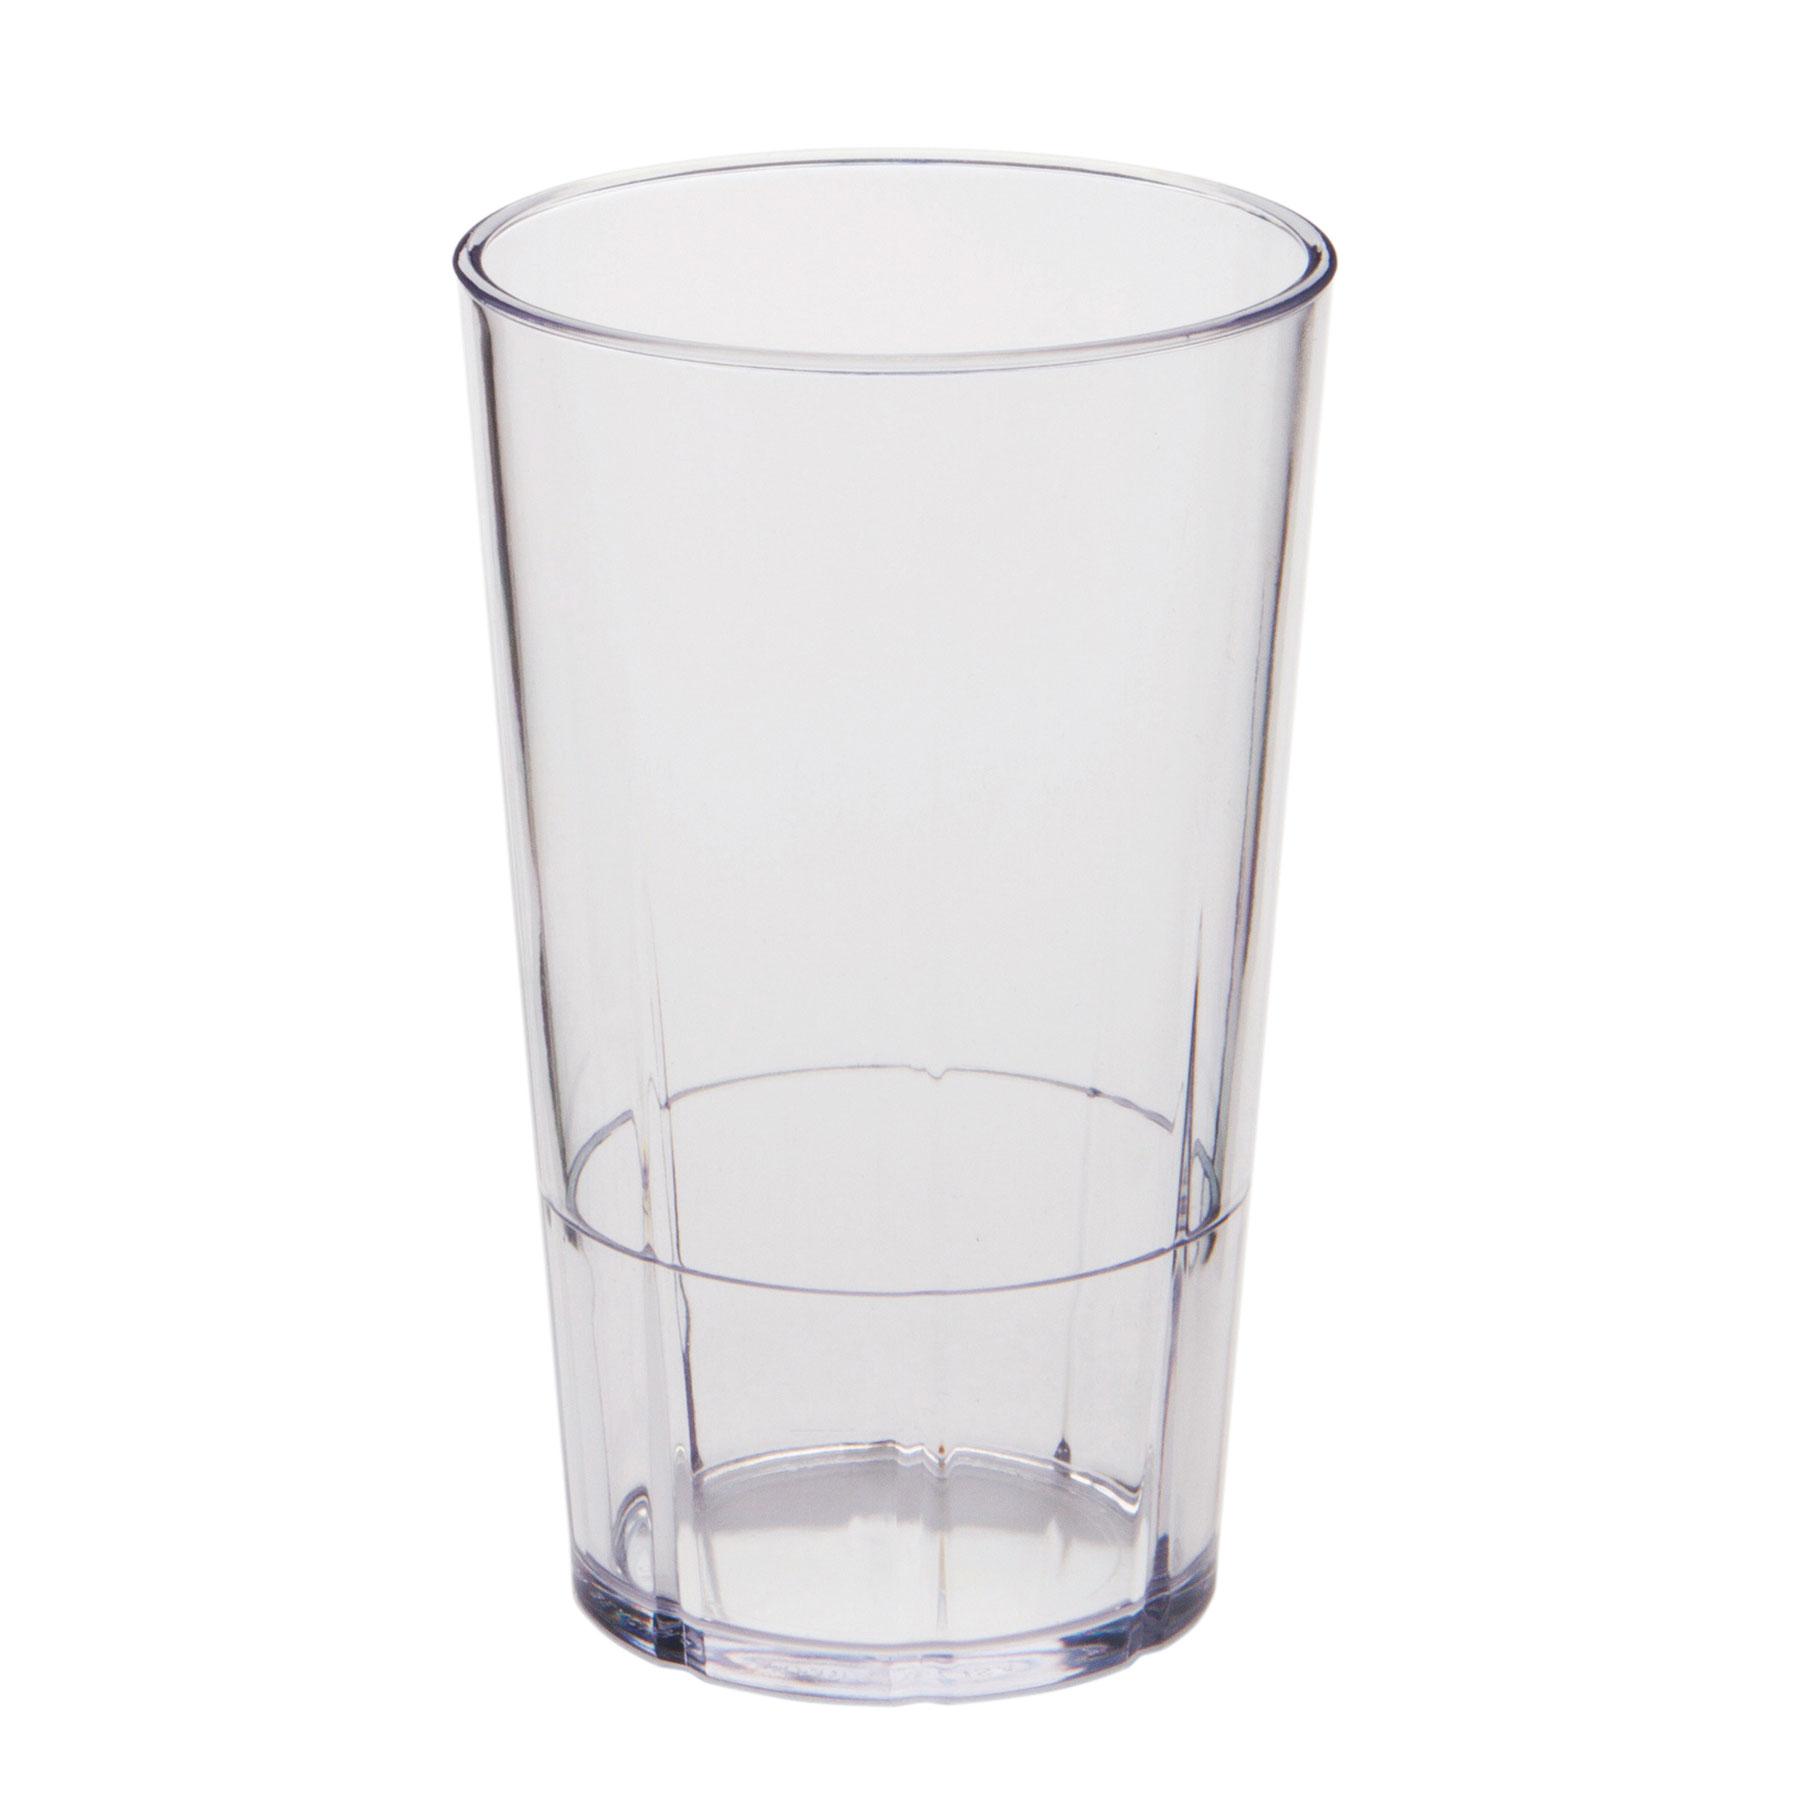 Cambro LDT16152 plastic drinkware